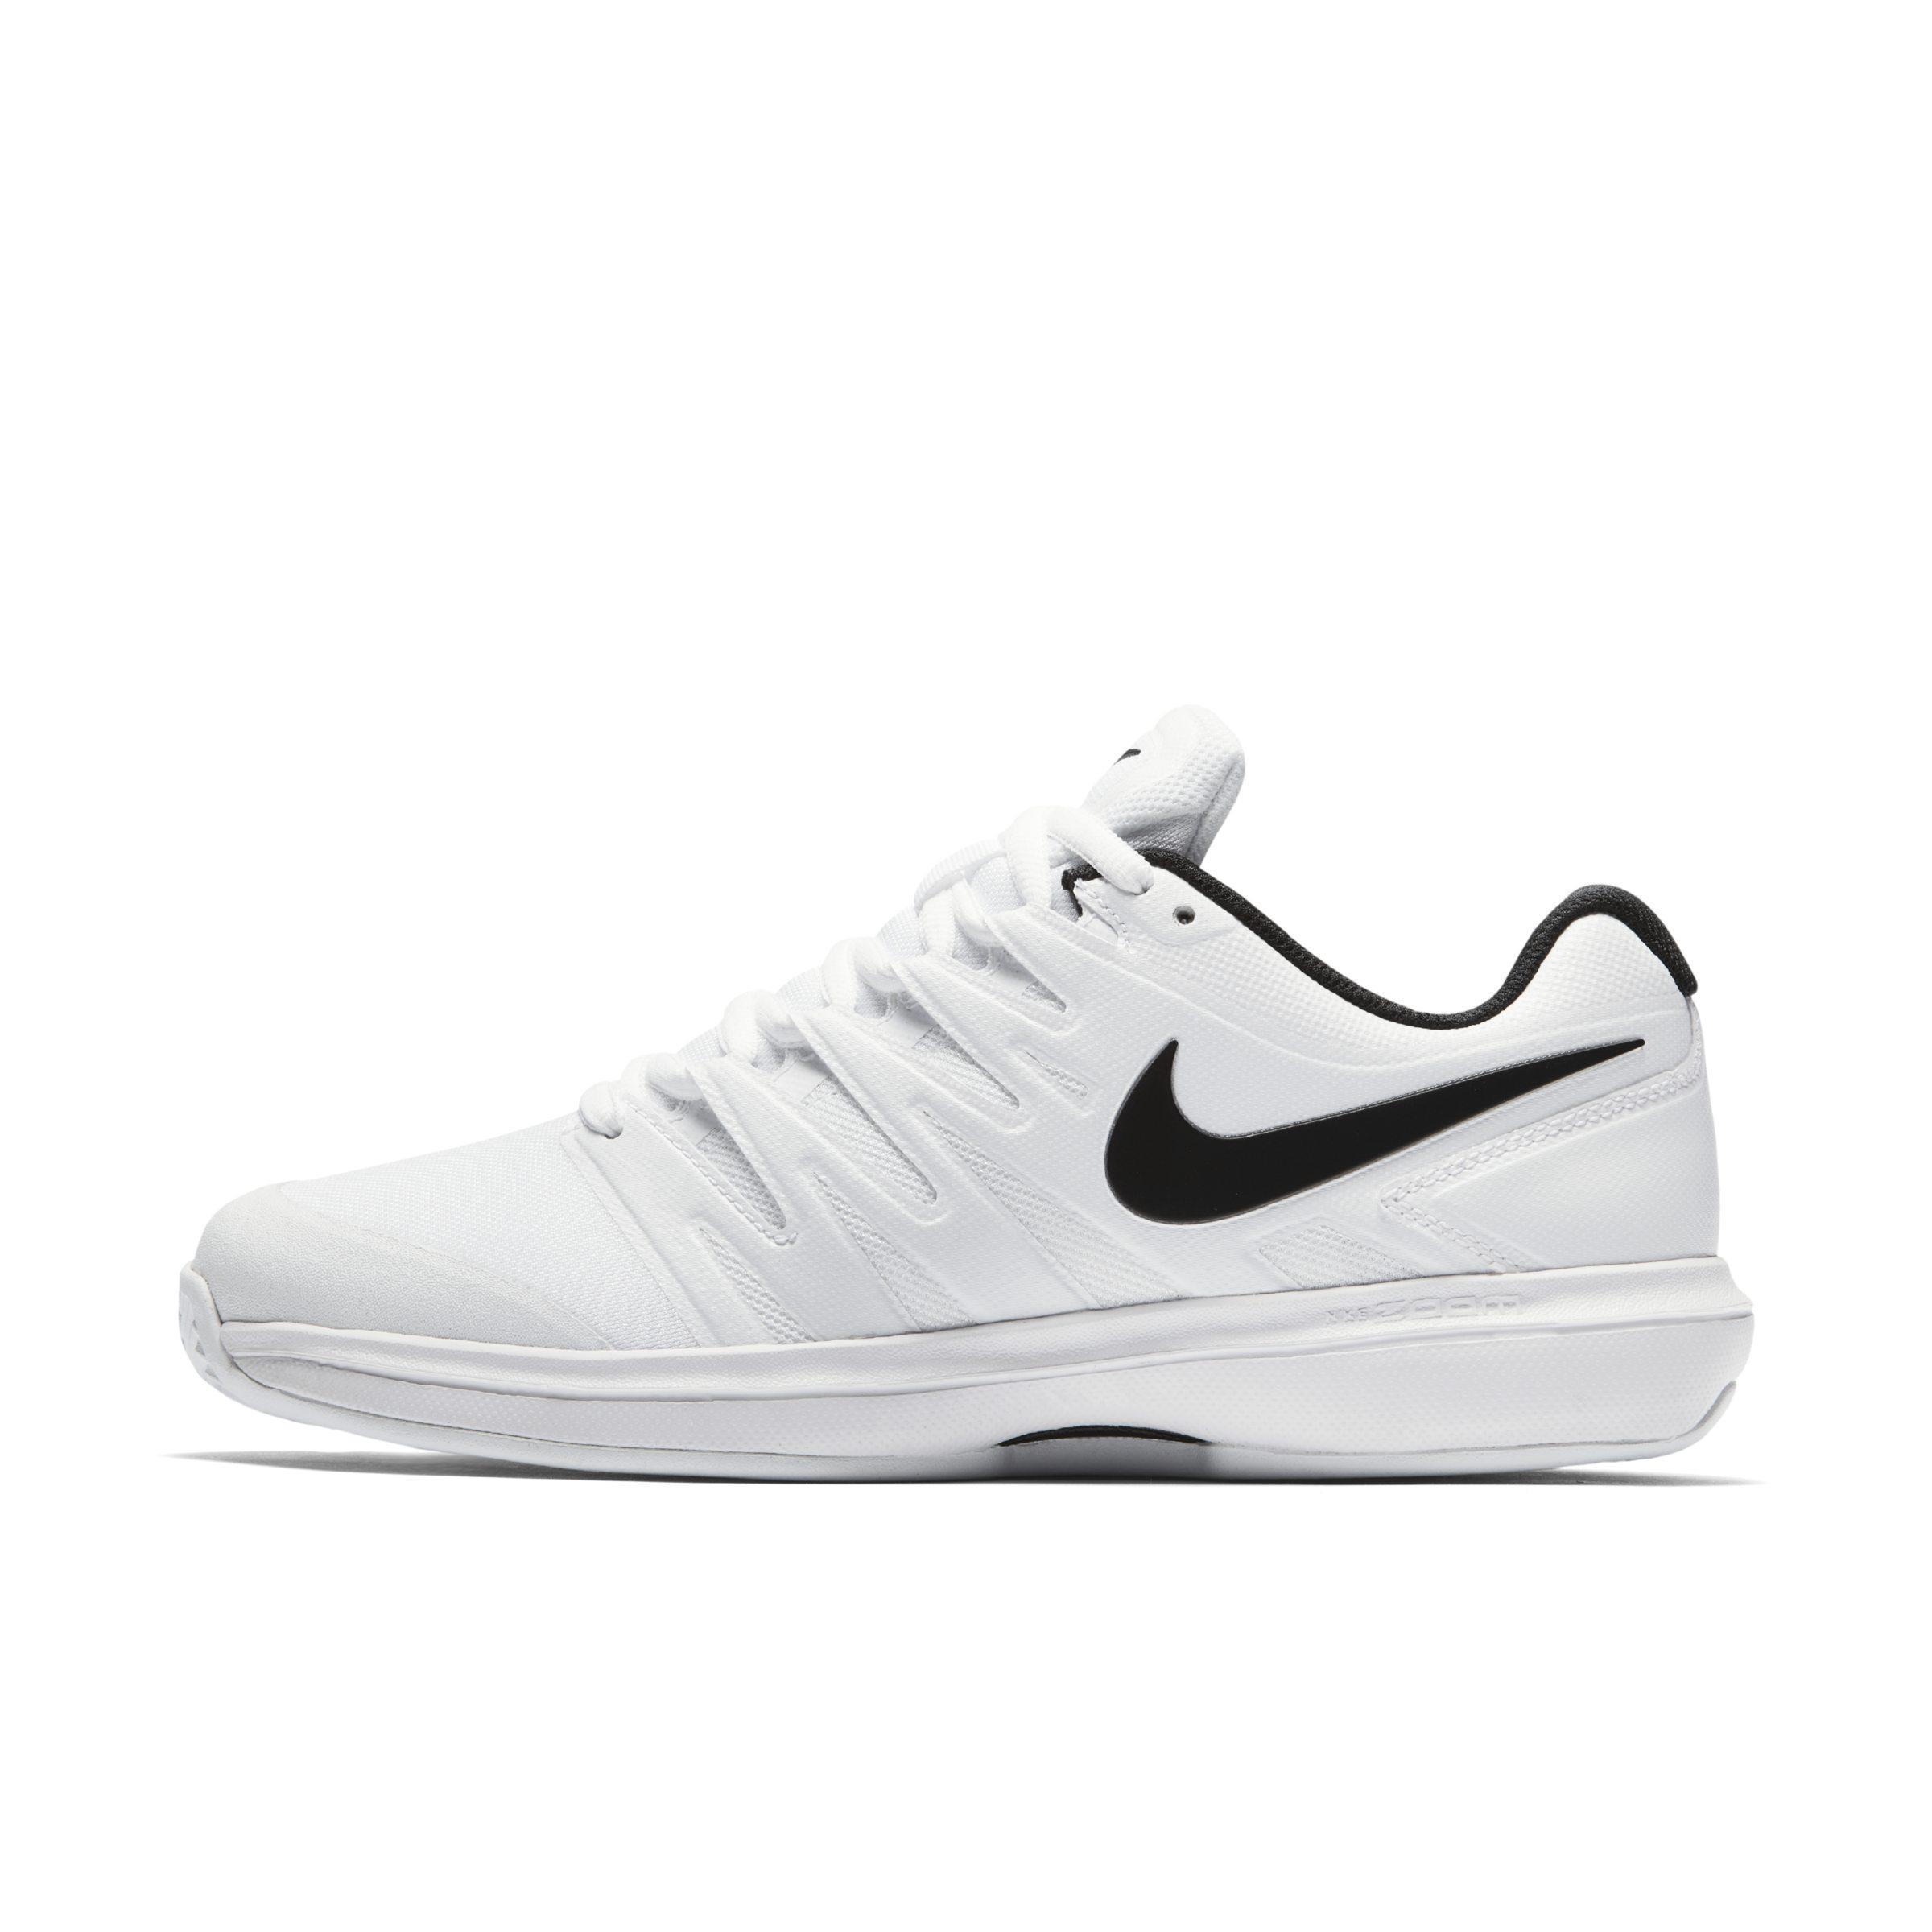 ef1da7564234 Nike Air Zoom Prestige Clay Tennis Shoe in White for Men - Lyst